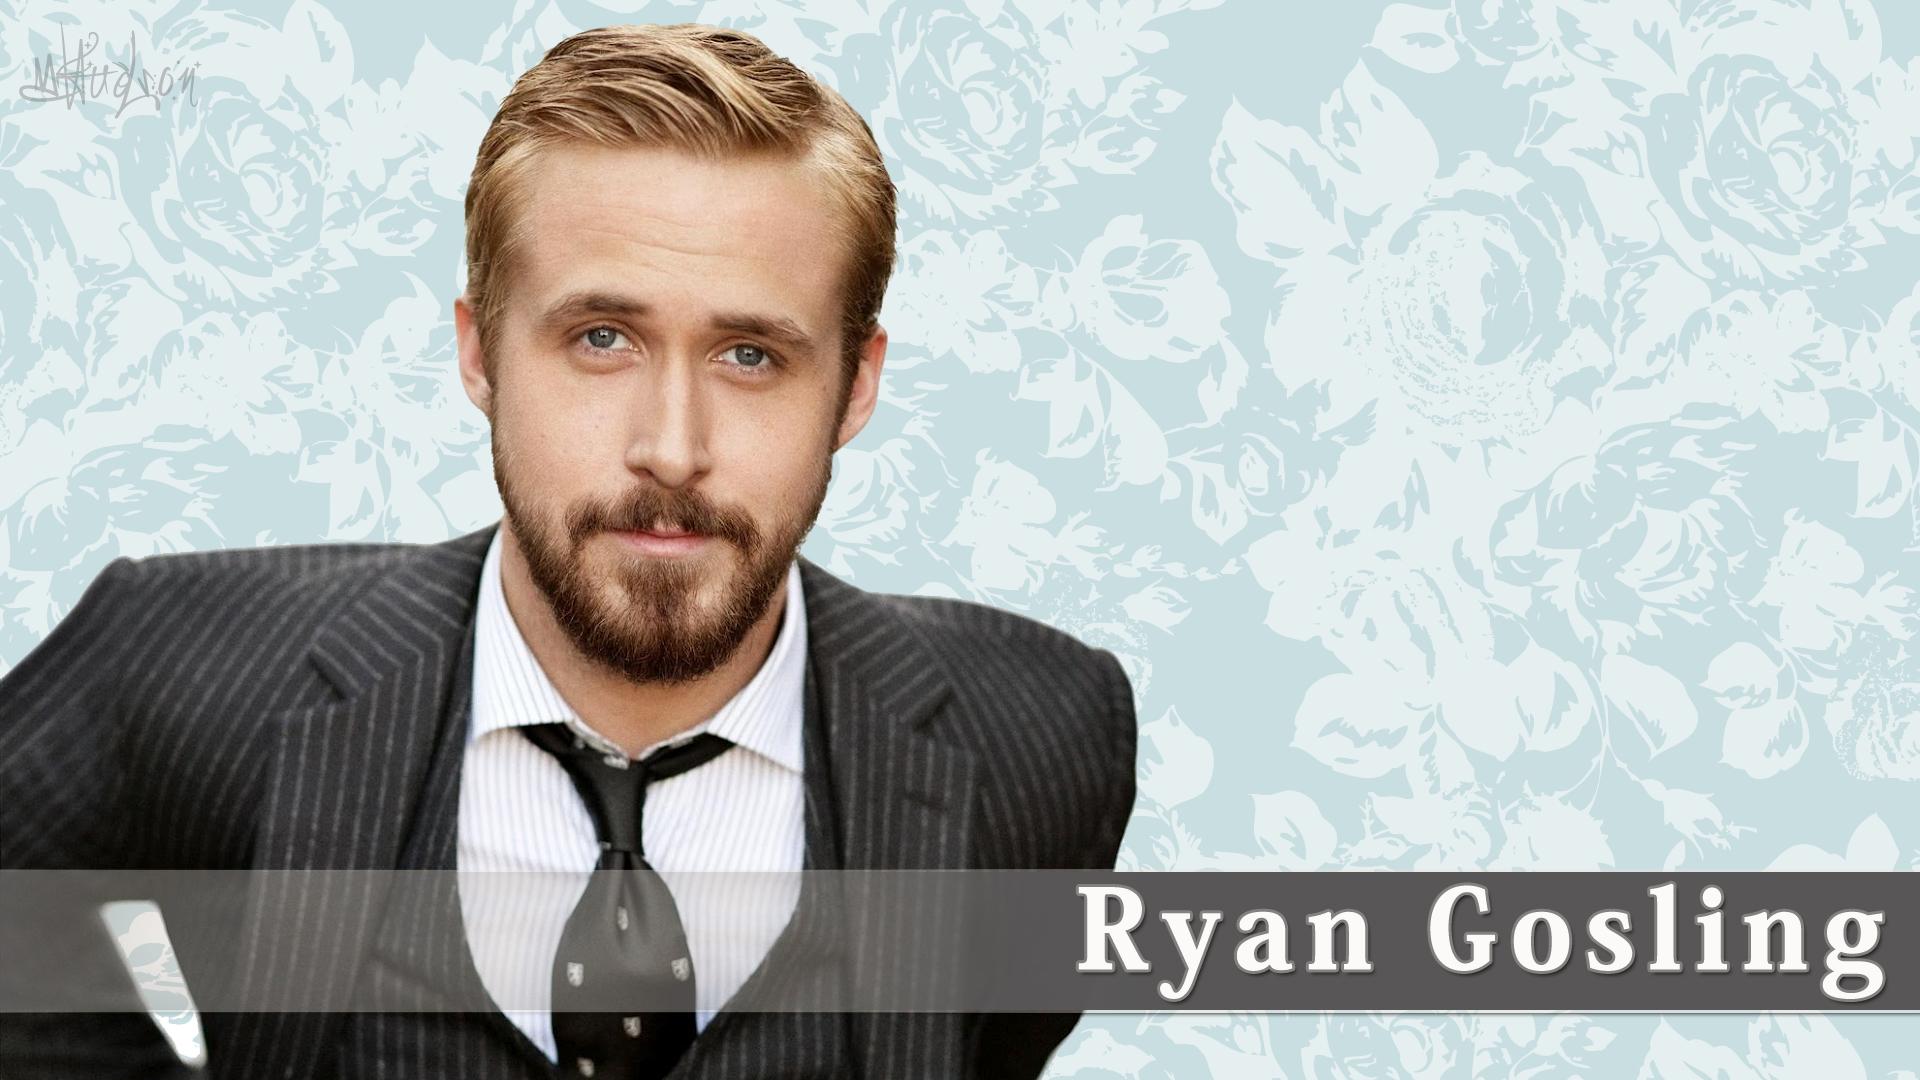 Ryan Gosling 2013 Ryan Gosling Hd Wallpaper Ryan Gosling 1920x1080